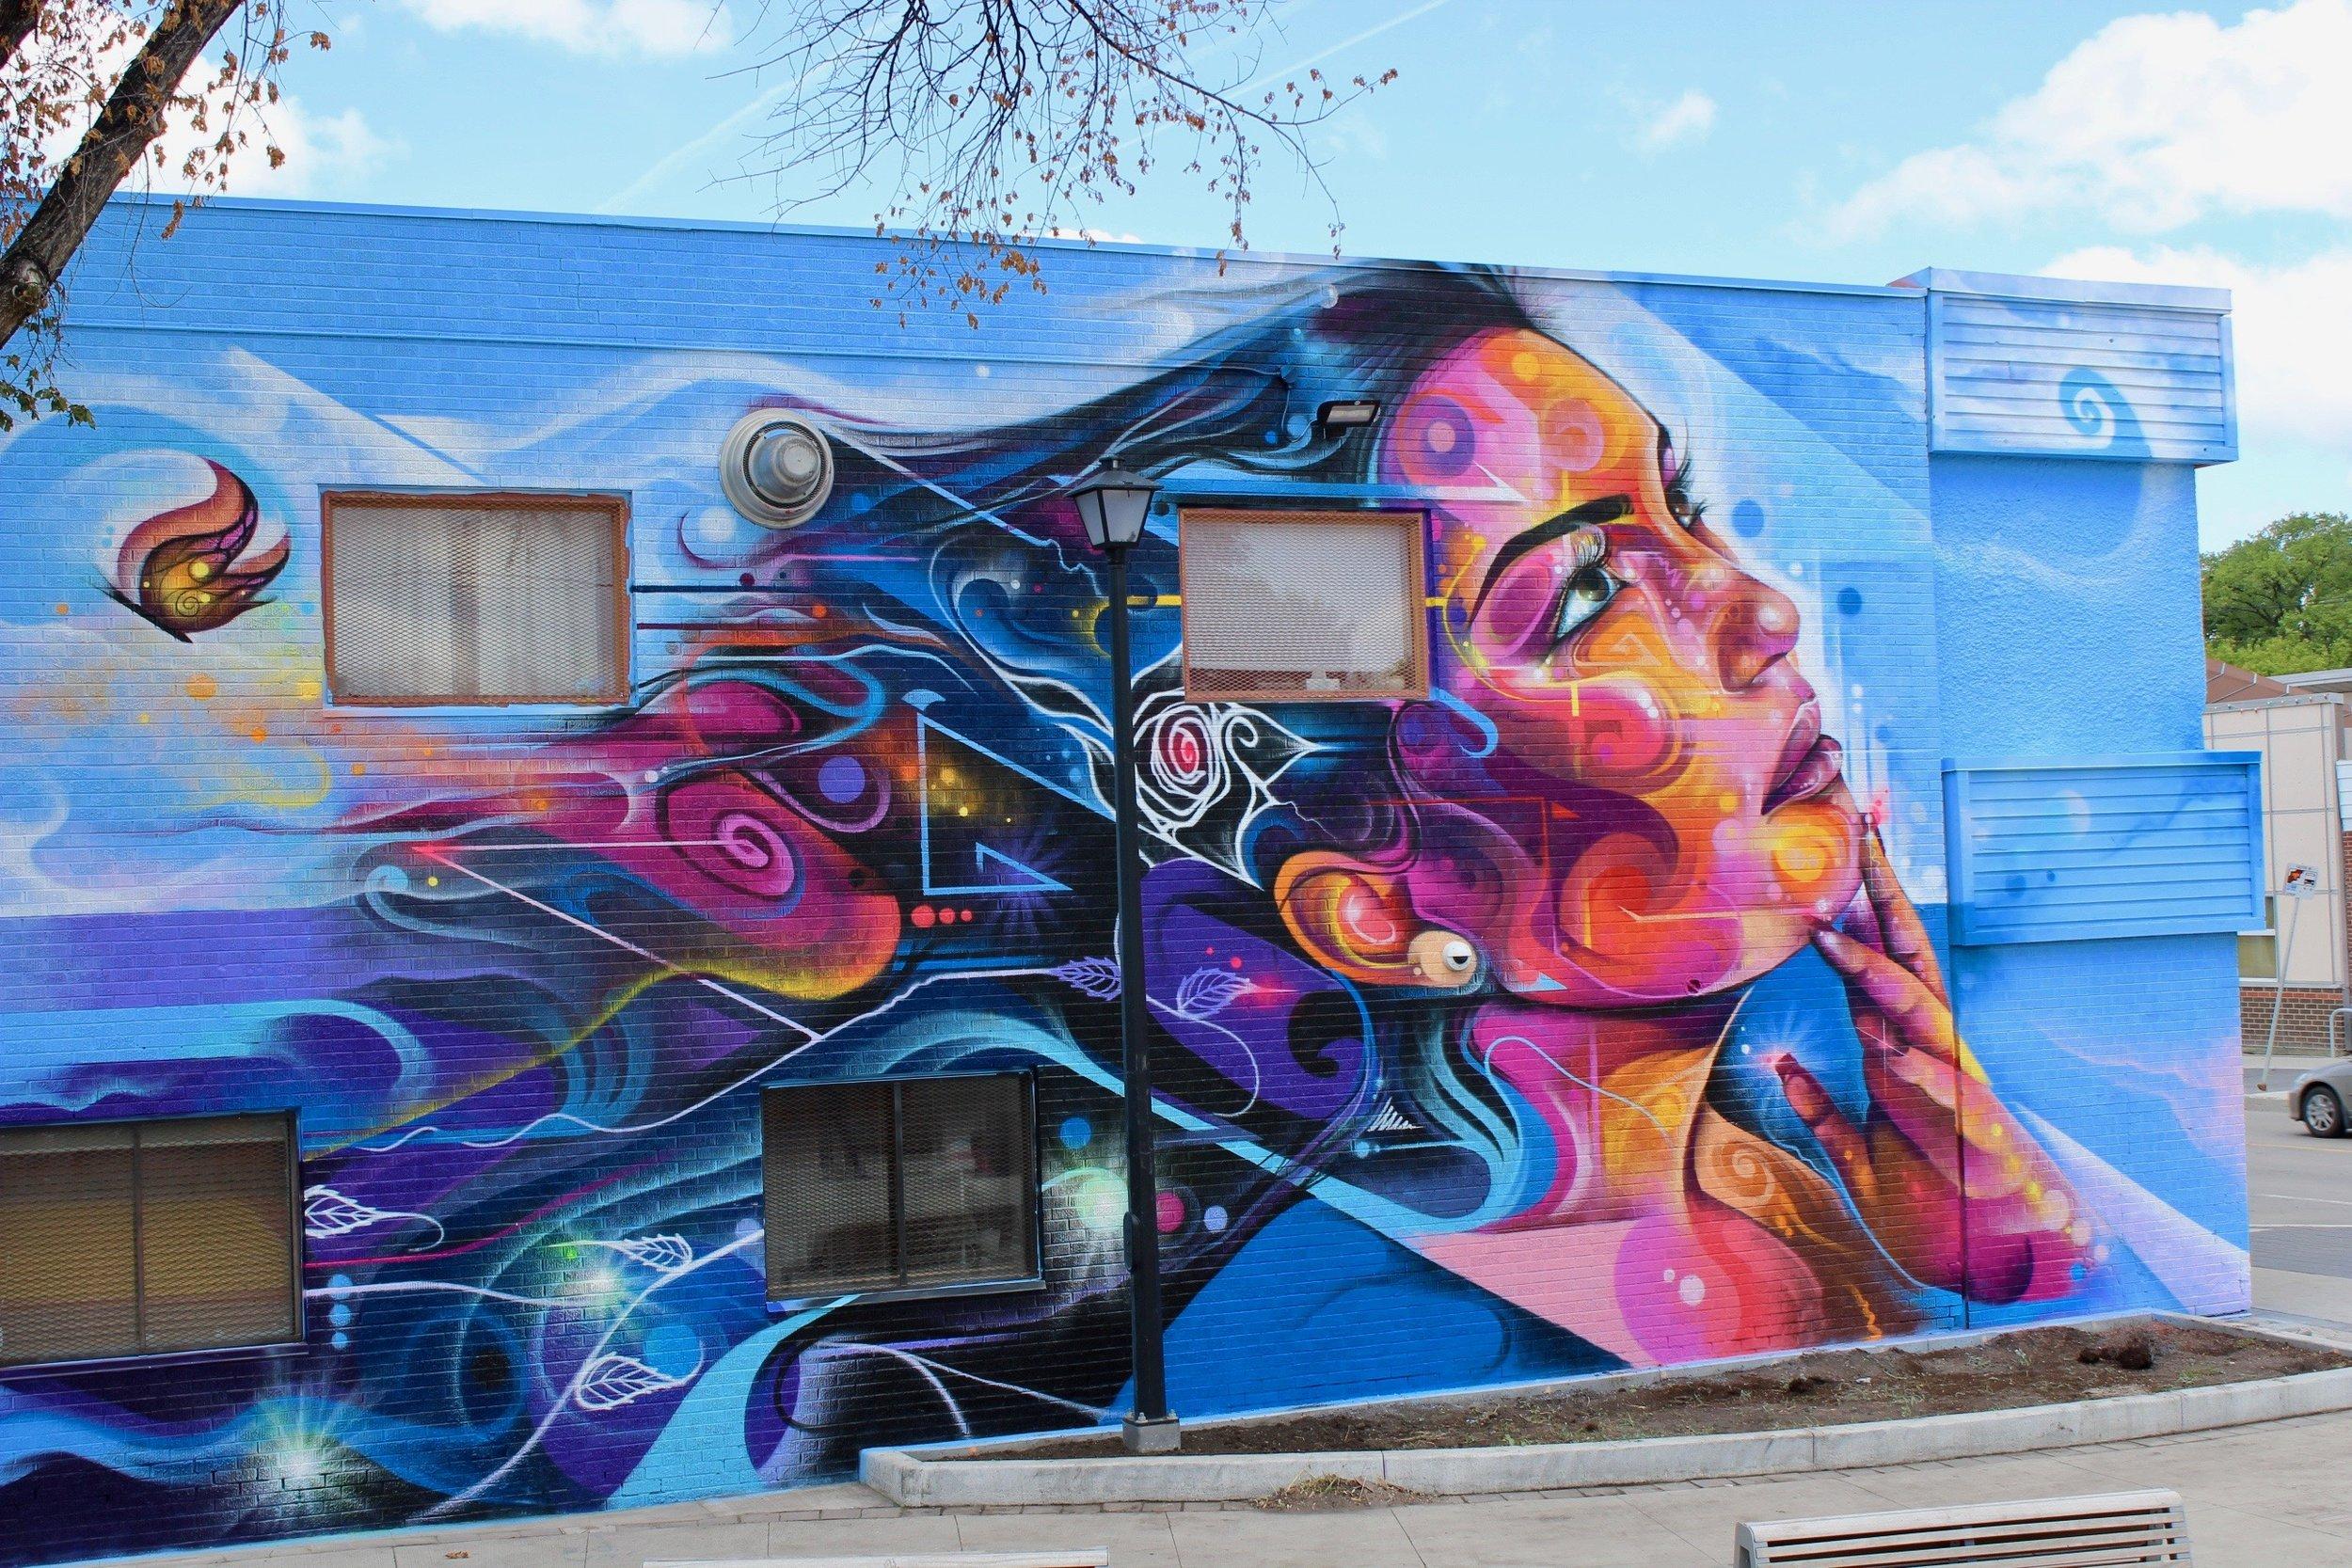 Winnipeg, Canada, 2018